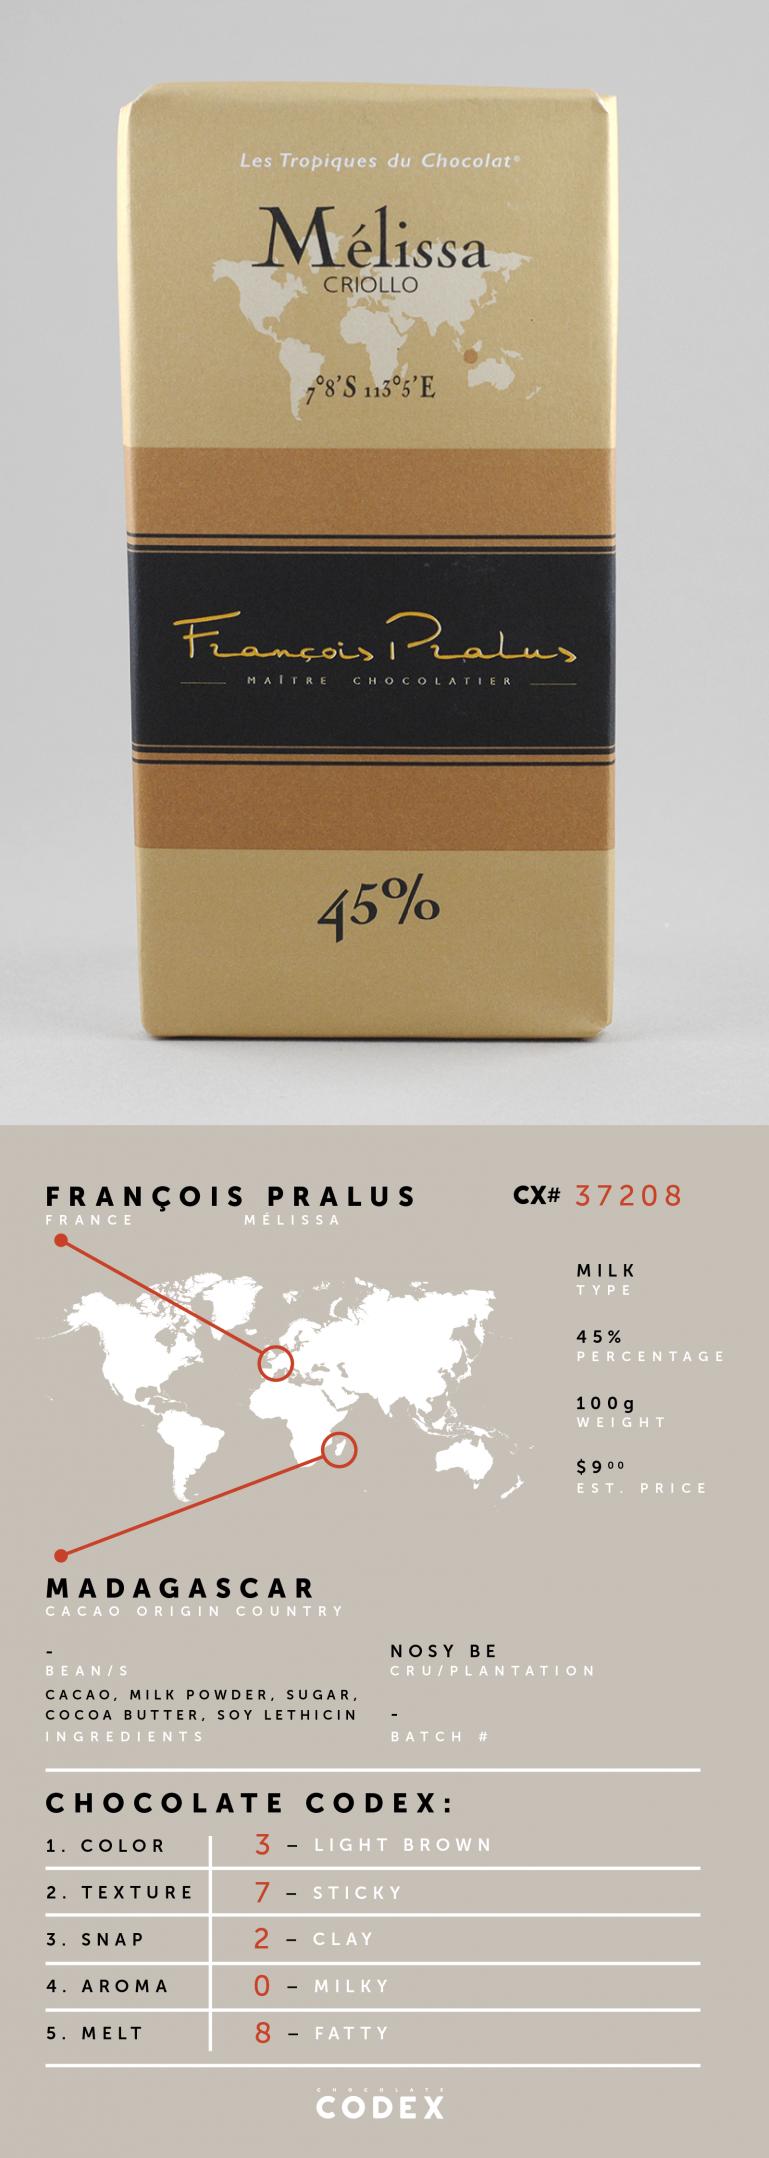 ChocolateCodex_Pralus_Melissa_Madagascar_45%